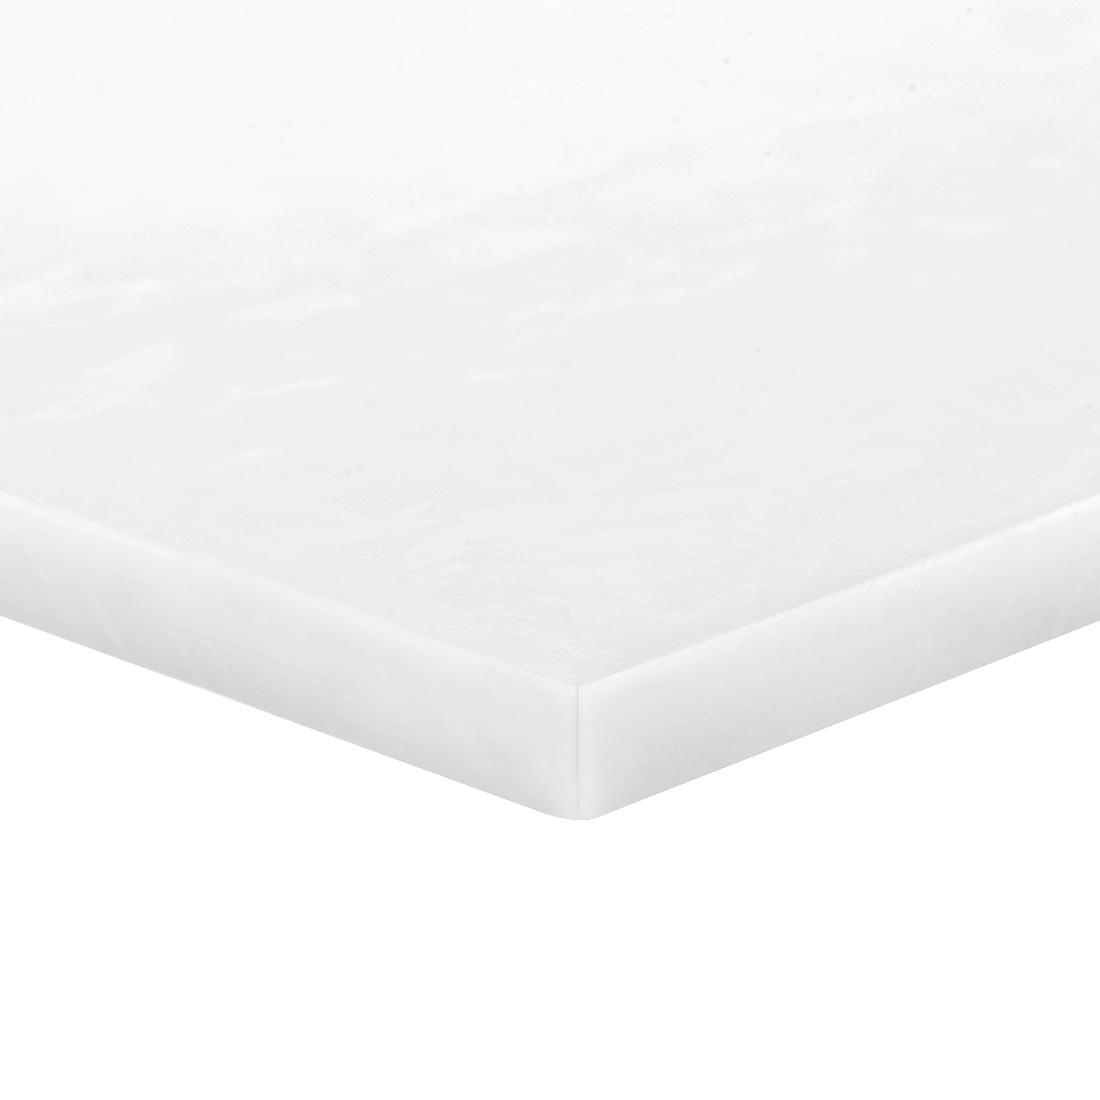 Acetal POM Sheet Polyoxymethylene Plate Sheet 200 x 200 x 6mm White